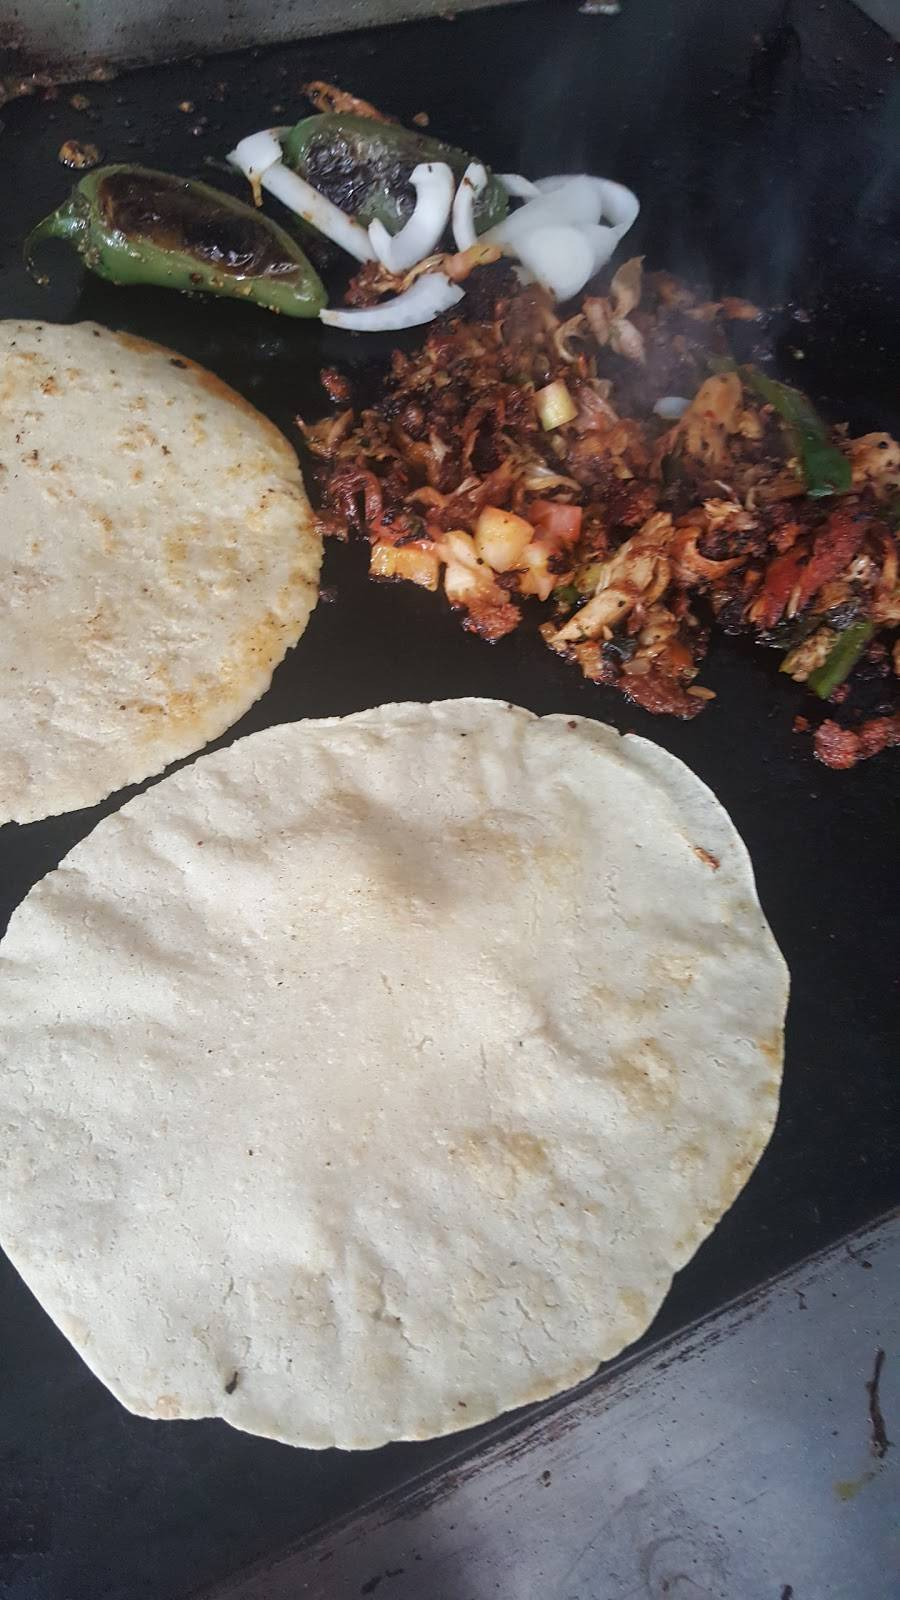 LA VILLA Taqueria Mexicana | restaurant | 12694-12706 Northlake Blvd, West Palm Beach, FL 33412, USA | 5619326264 OR +1 561-932-6264